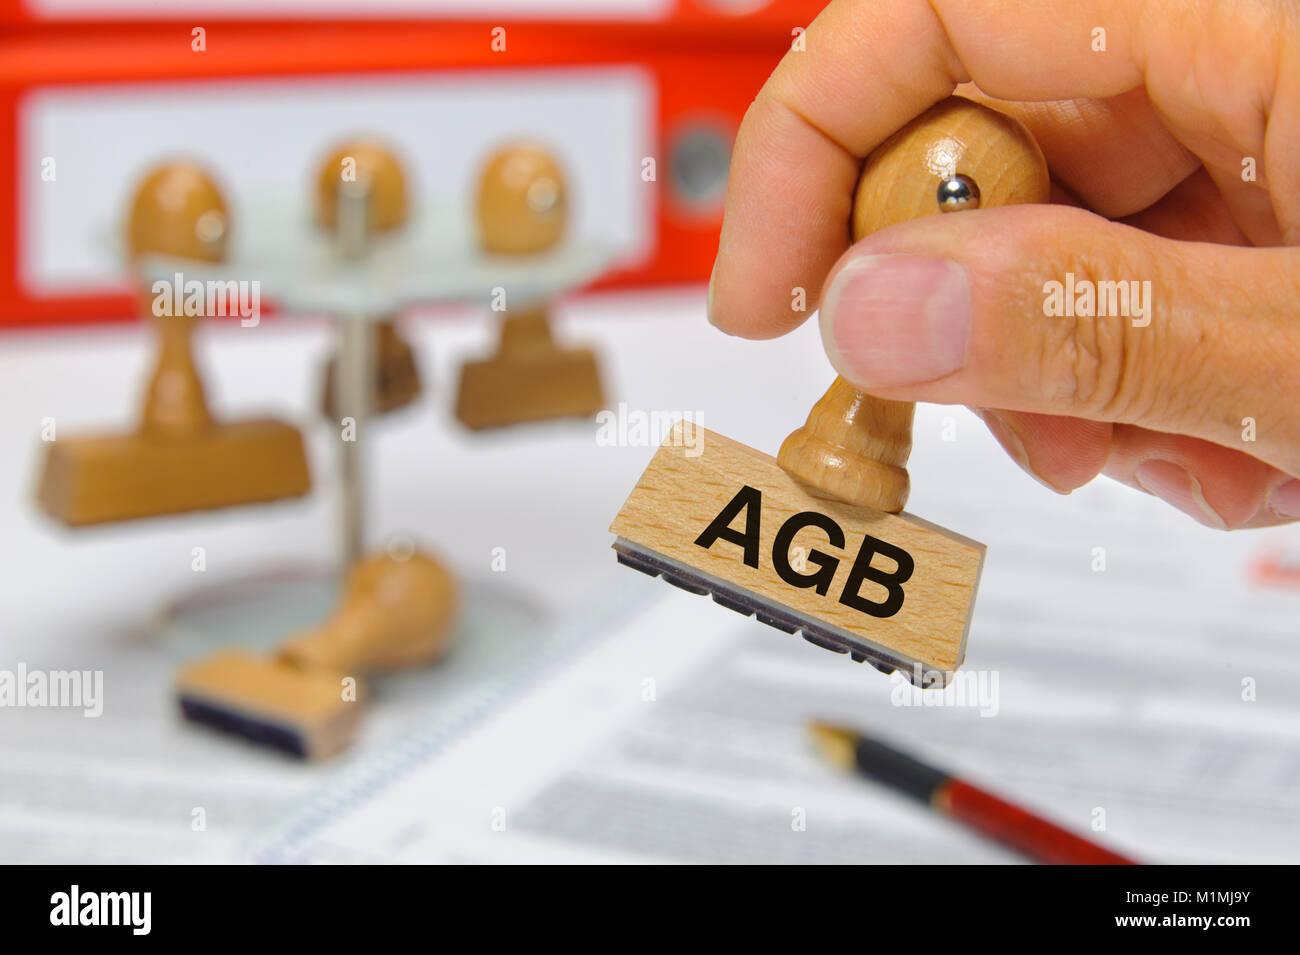 Stempel en mano beschriftet mit AGB Imagen De Stock